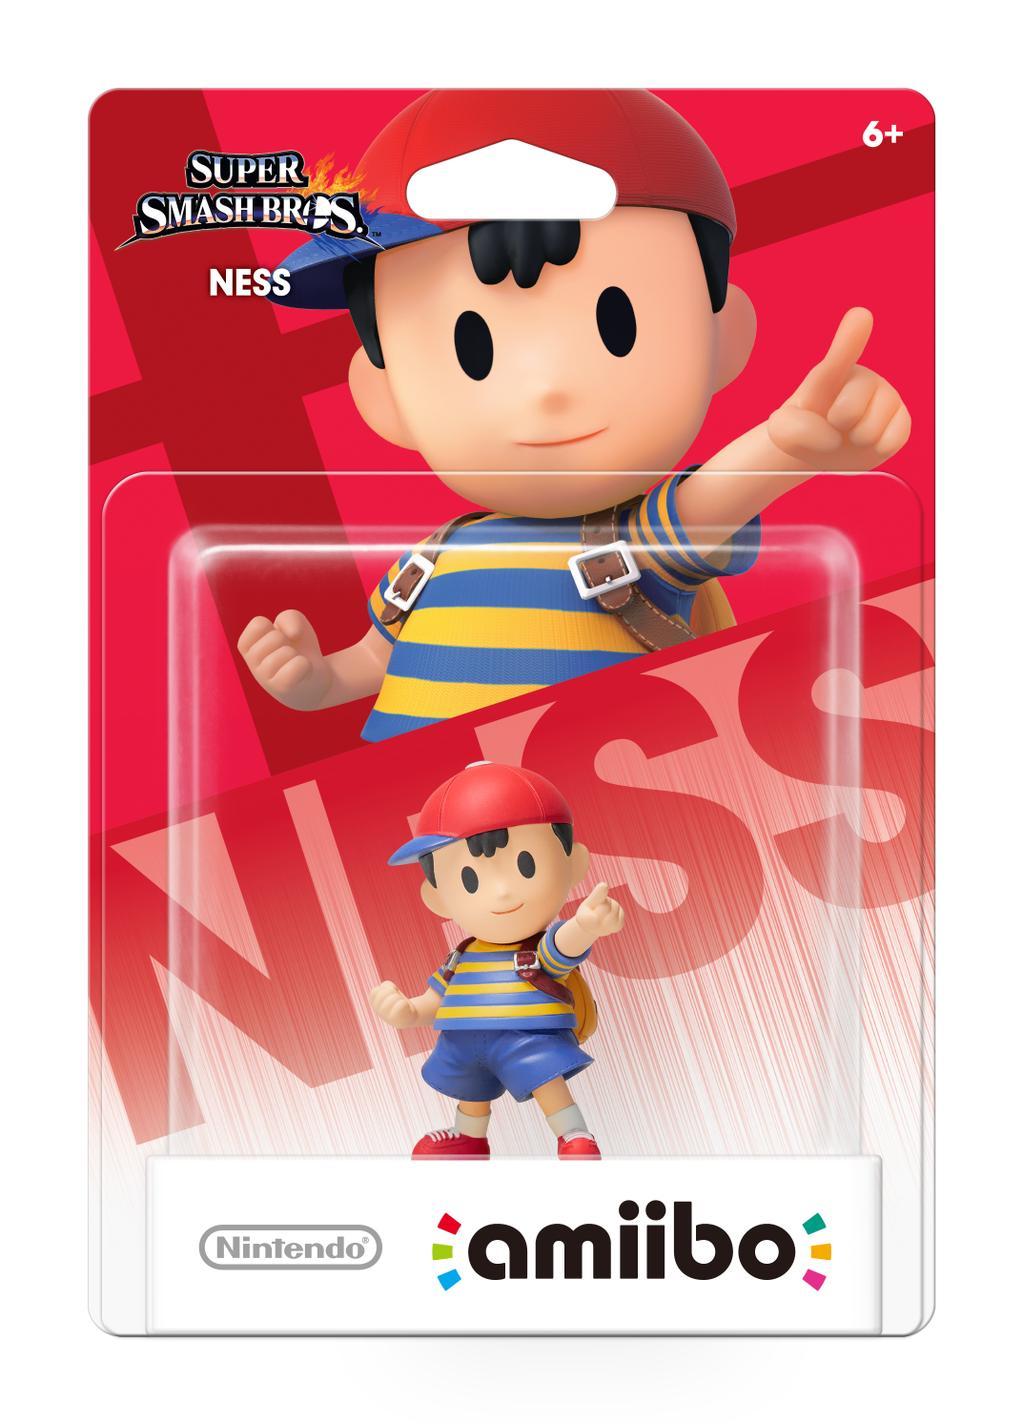 Update Gone Ness King Dedede Amiibo Up On Gamestop Nintendo